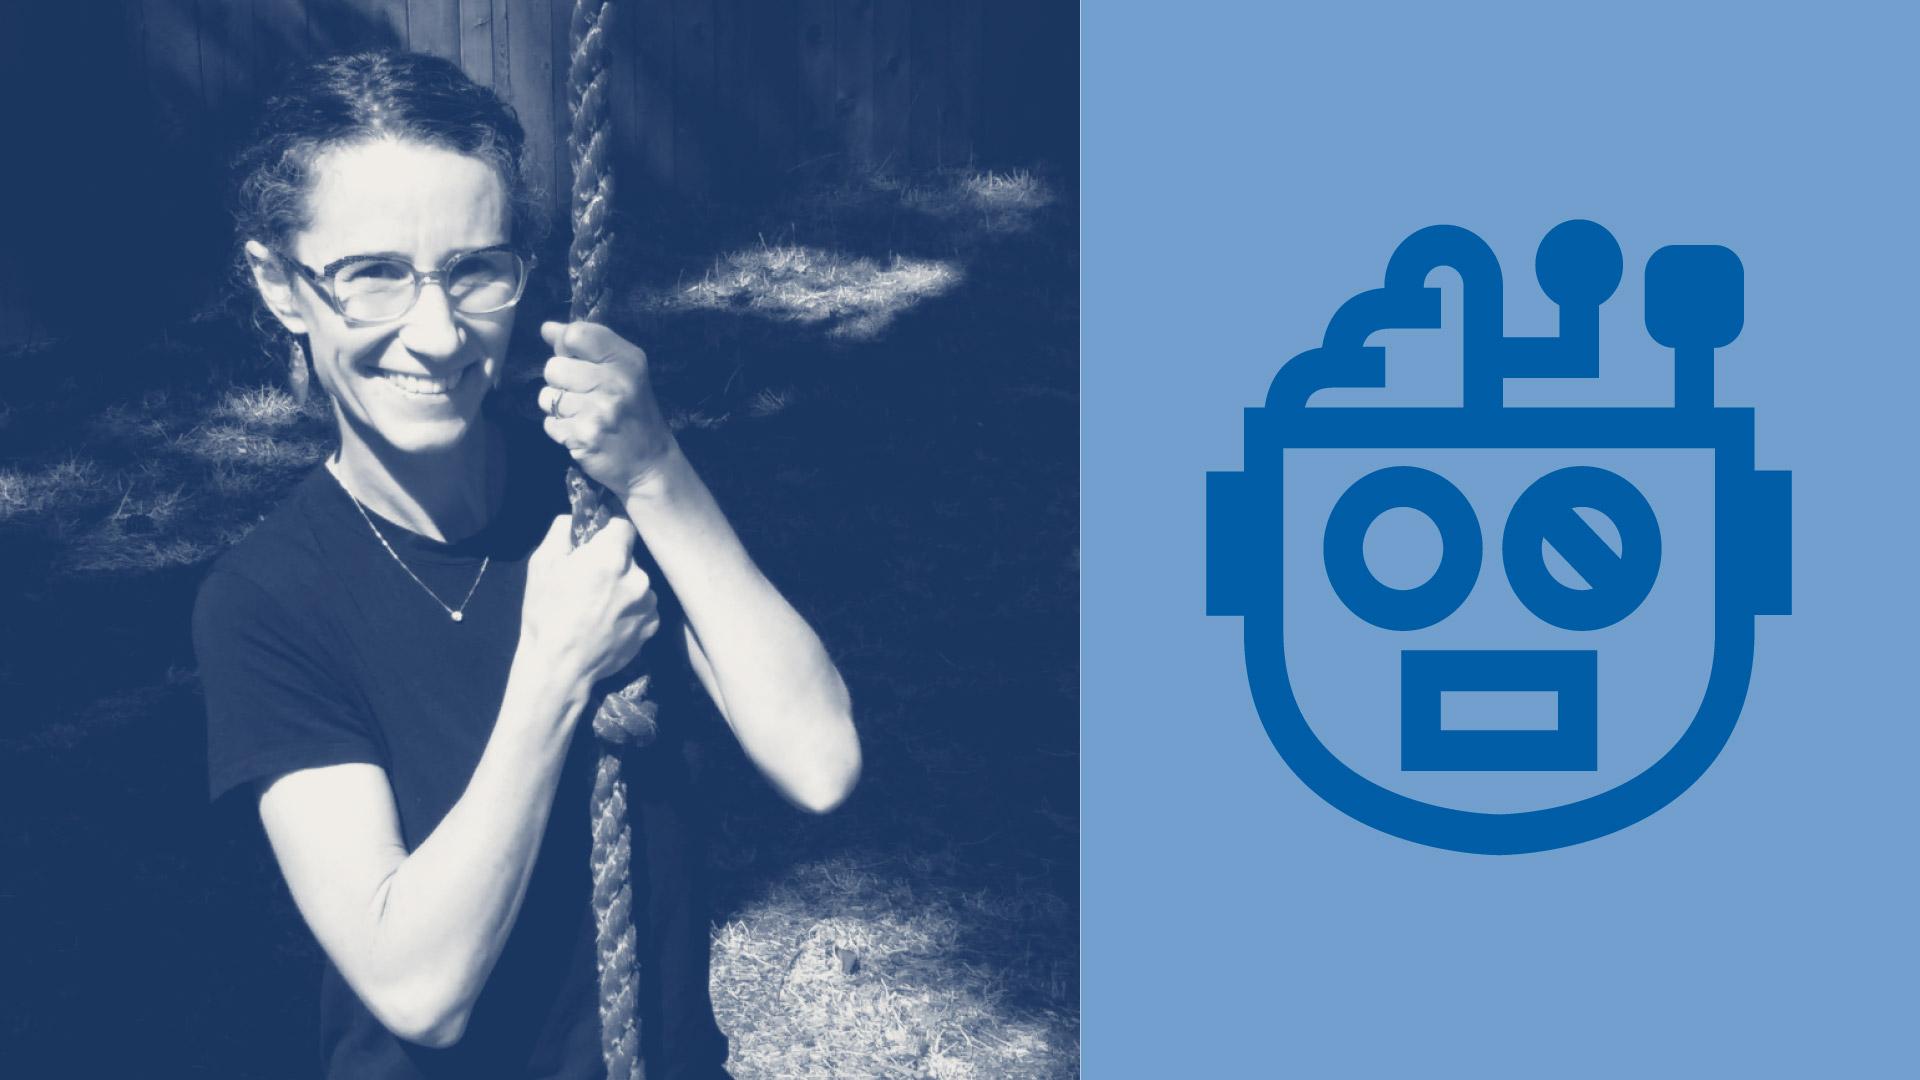 Meet data scientist and AI expert Brooke Cowan